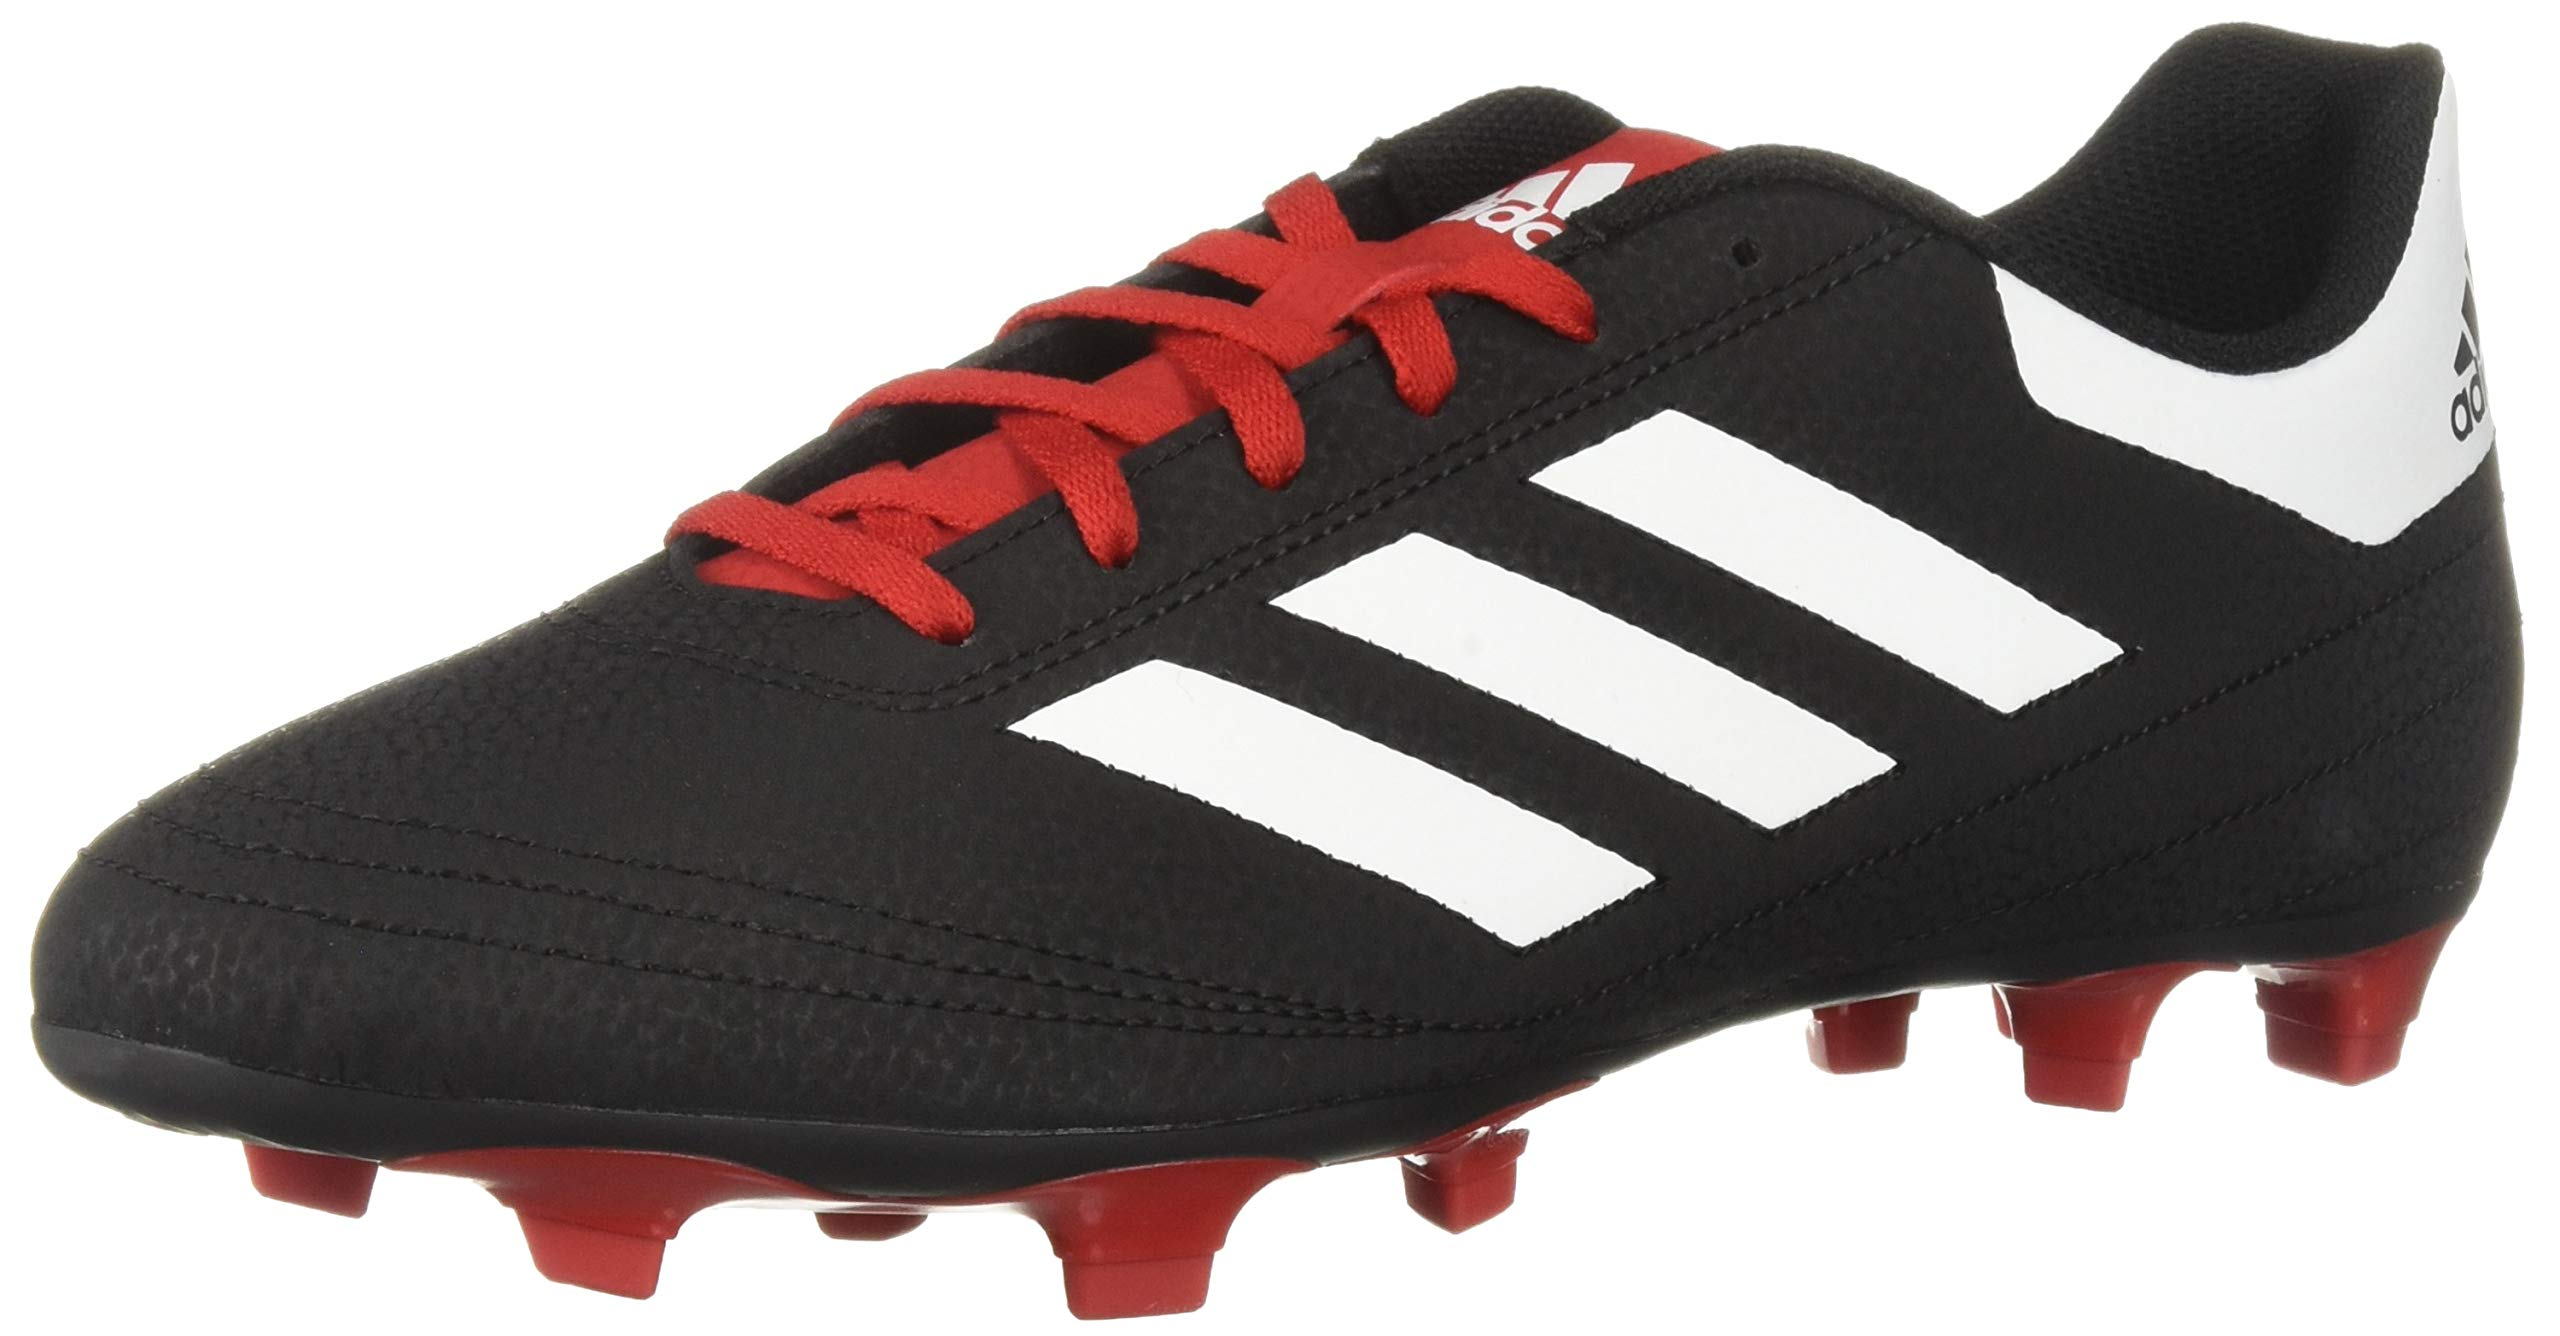 adidas Men's Goletto VI Firm Ground, Black/White/Scarlet, 6.5 M US